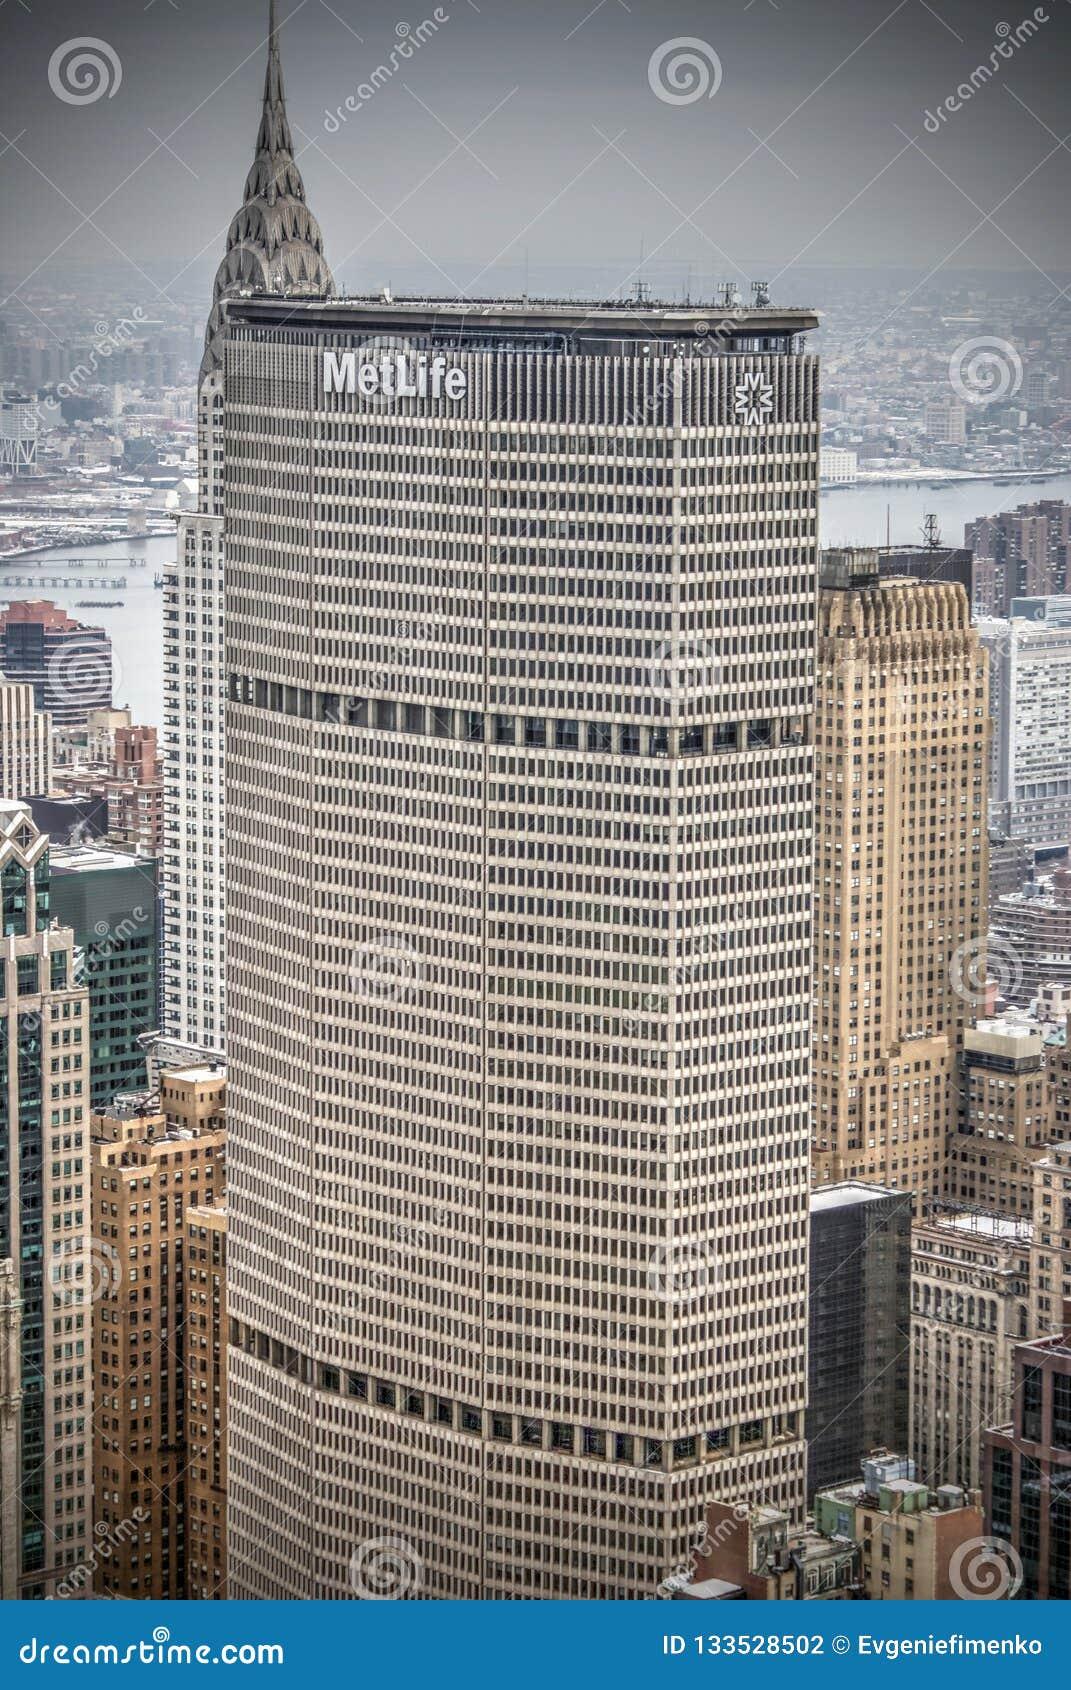 22 10 Metlife Building Photos   Free & Royalty Free Stock Photos ...